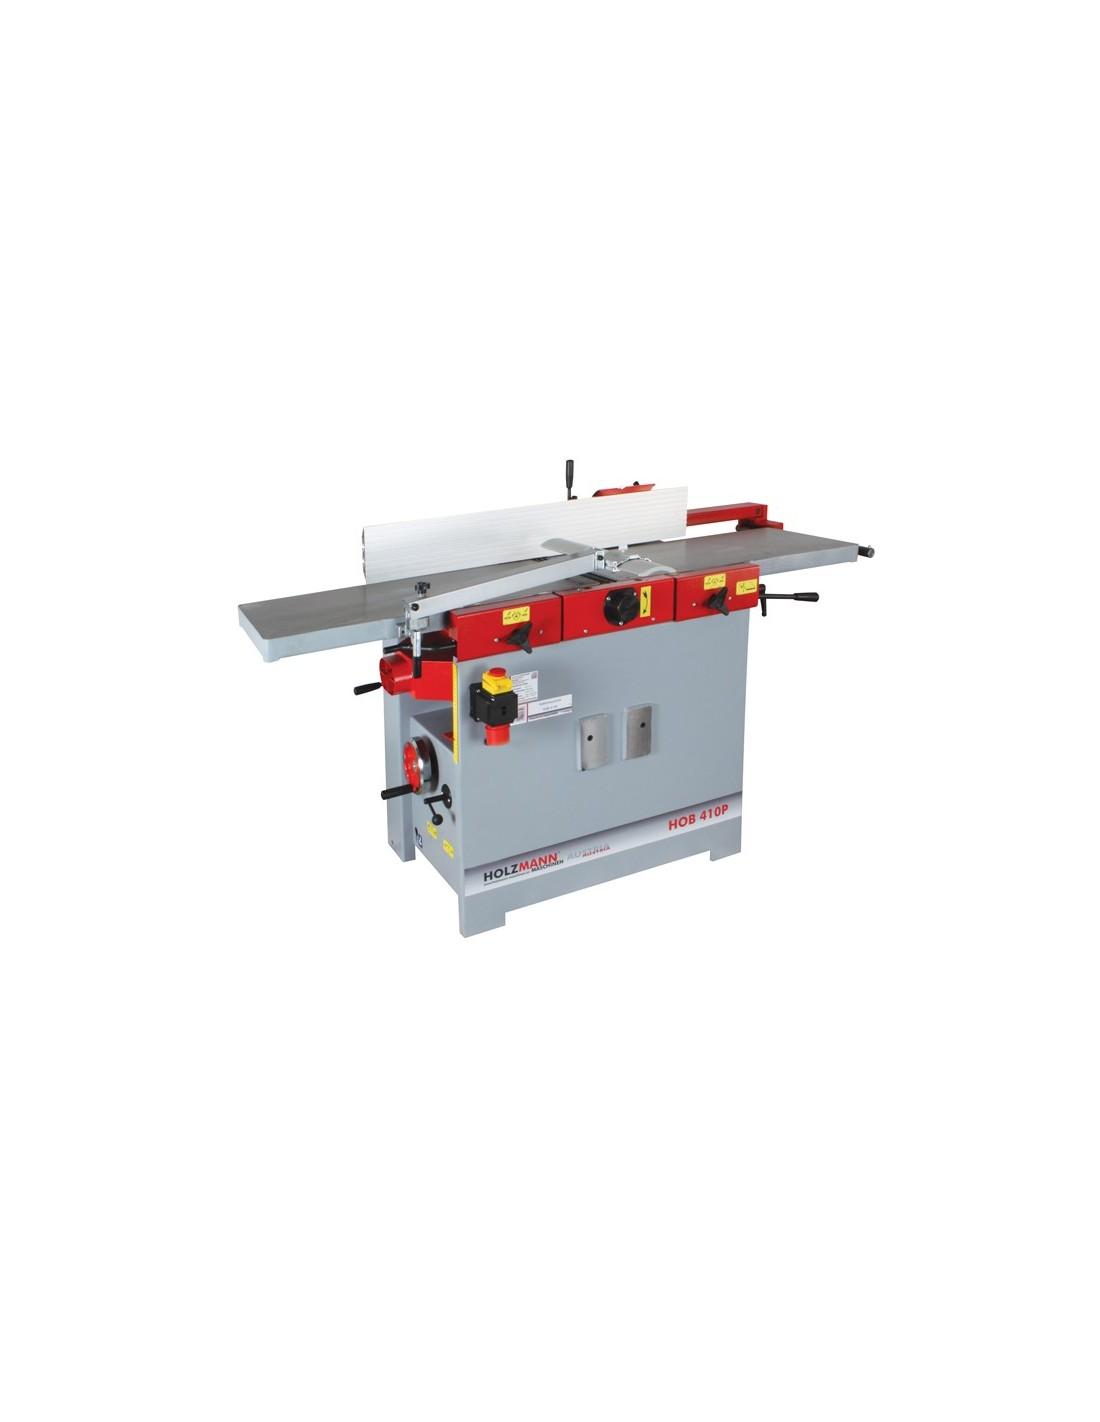 Masina pentru rindeluire si degrosare Holzmann HOB 410P